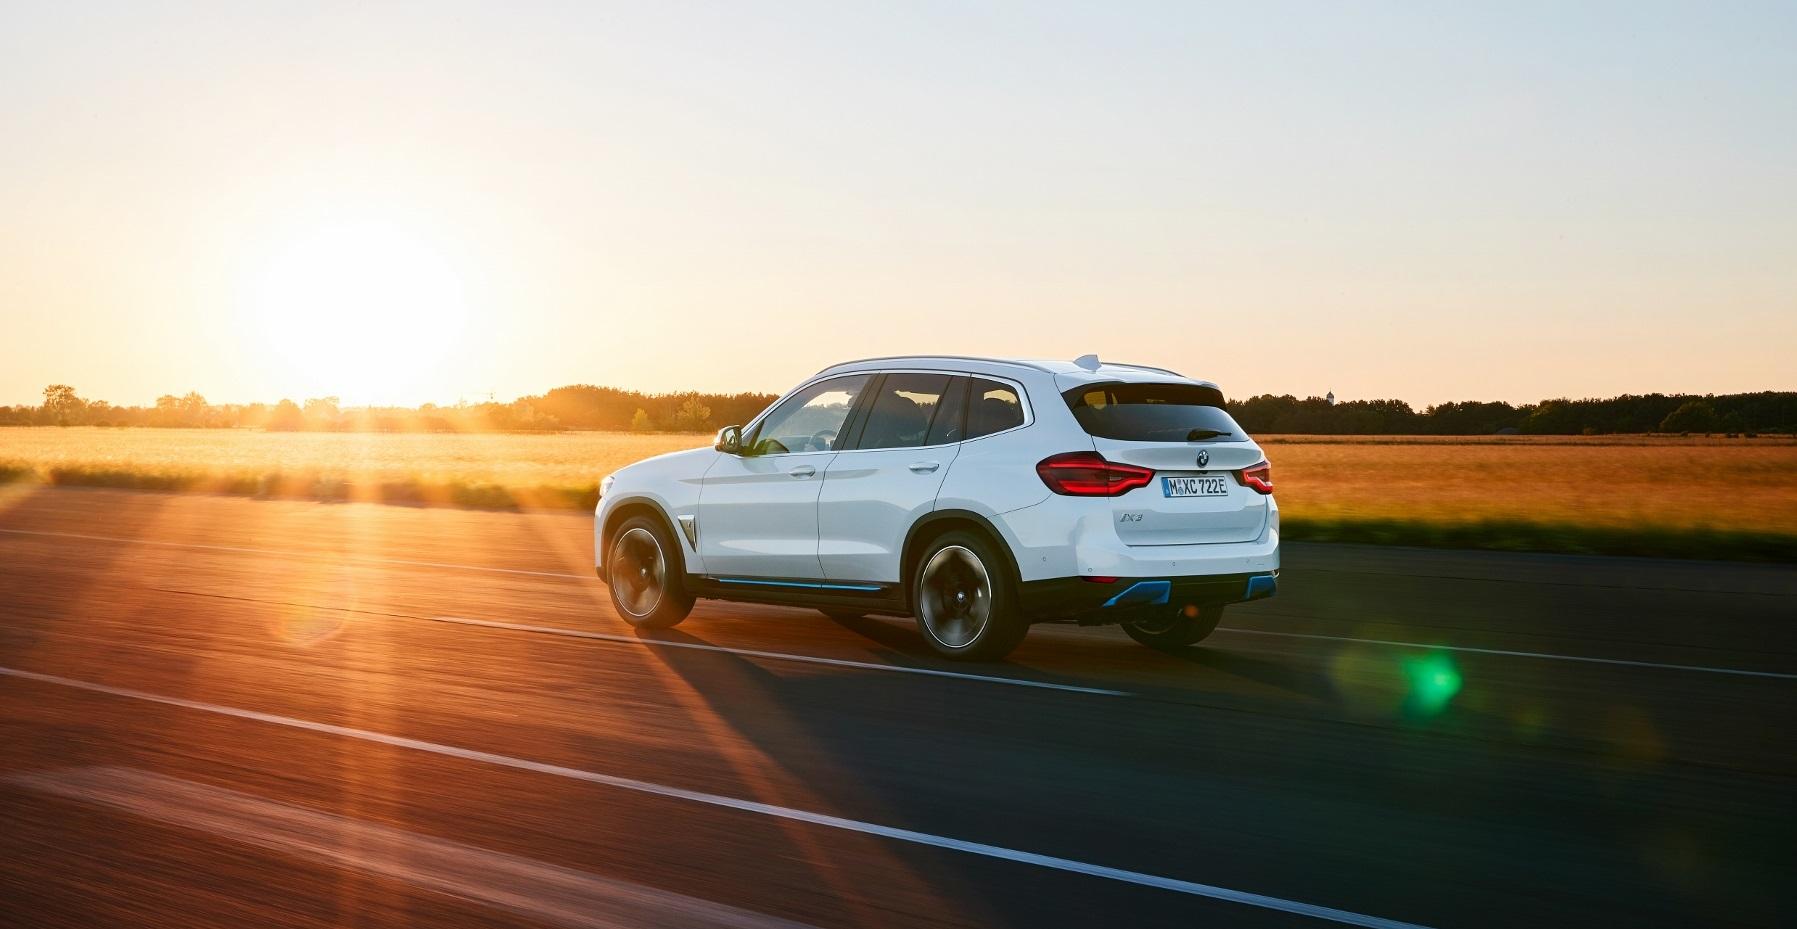 BMW ukázalo elektrické SUV iX3 s dojazdom 459 km